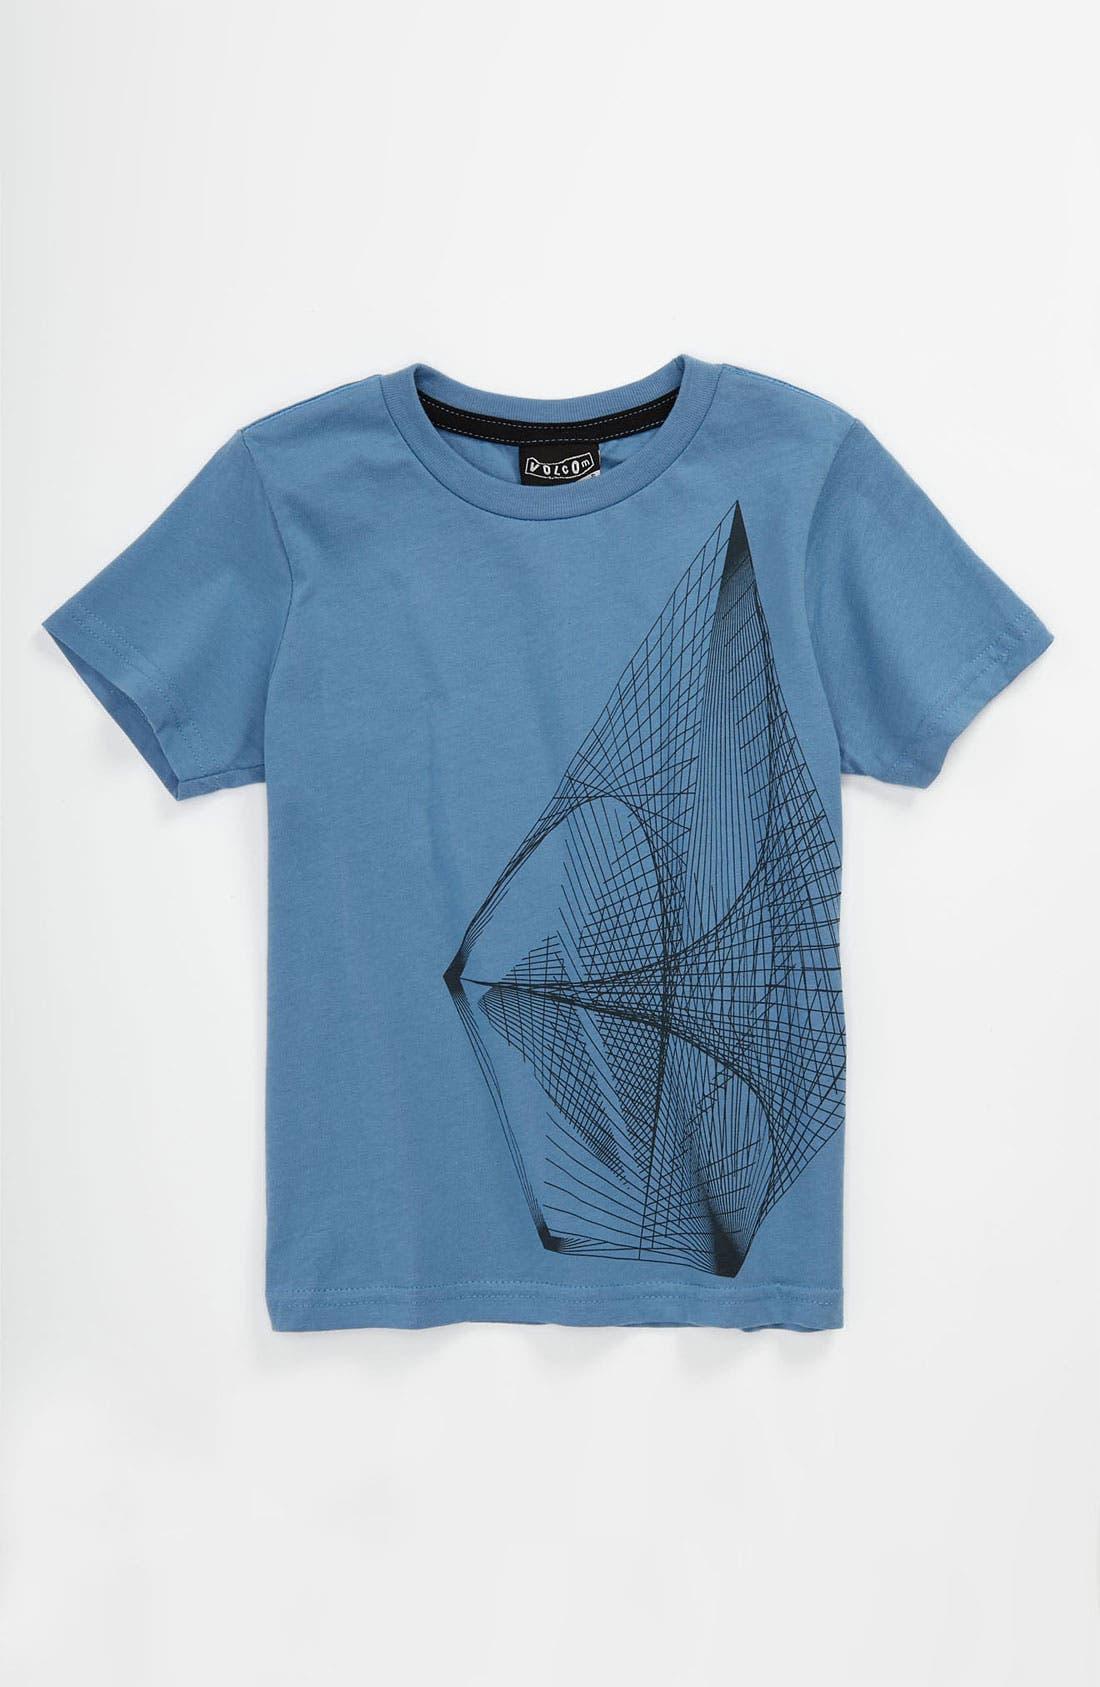 Main Image - Volcom 'Projected' T-Shirt (Big Boys)